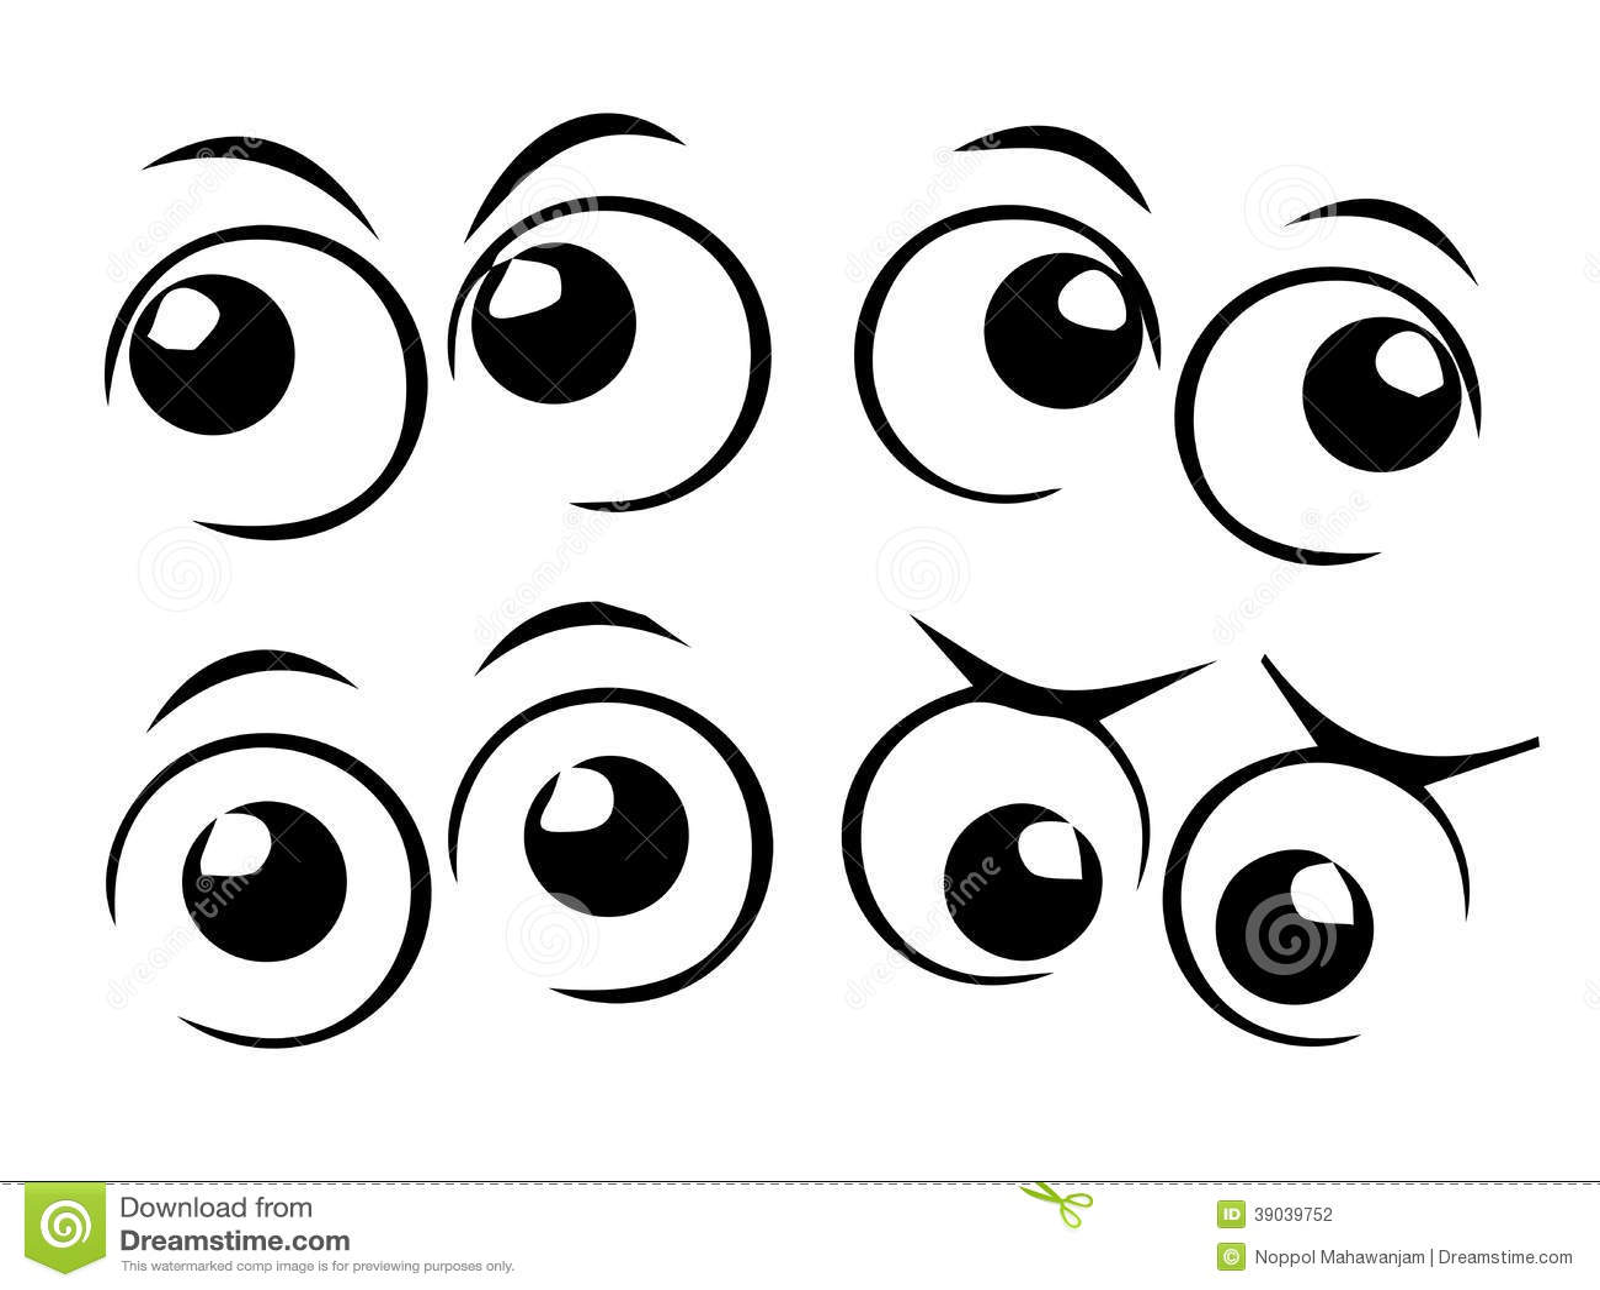 Cartoon eyes stock vector. Illustration of art, element ...